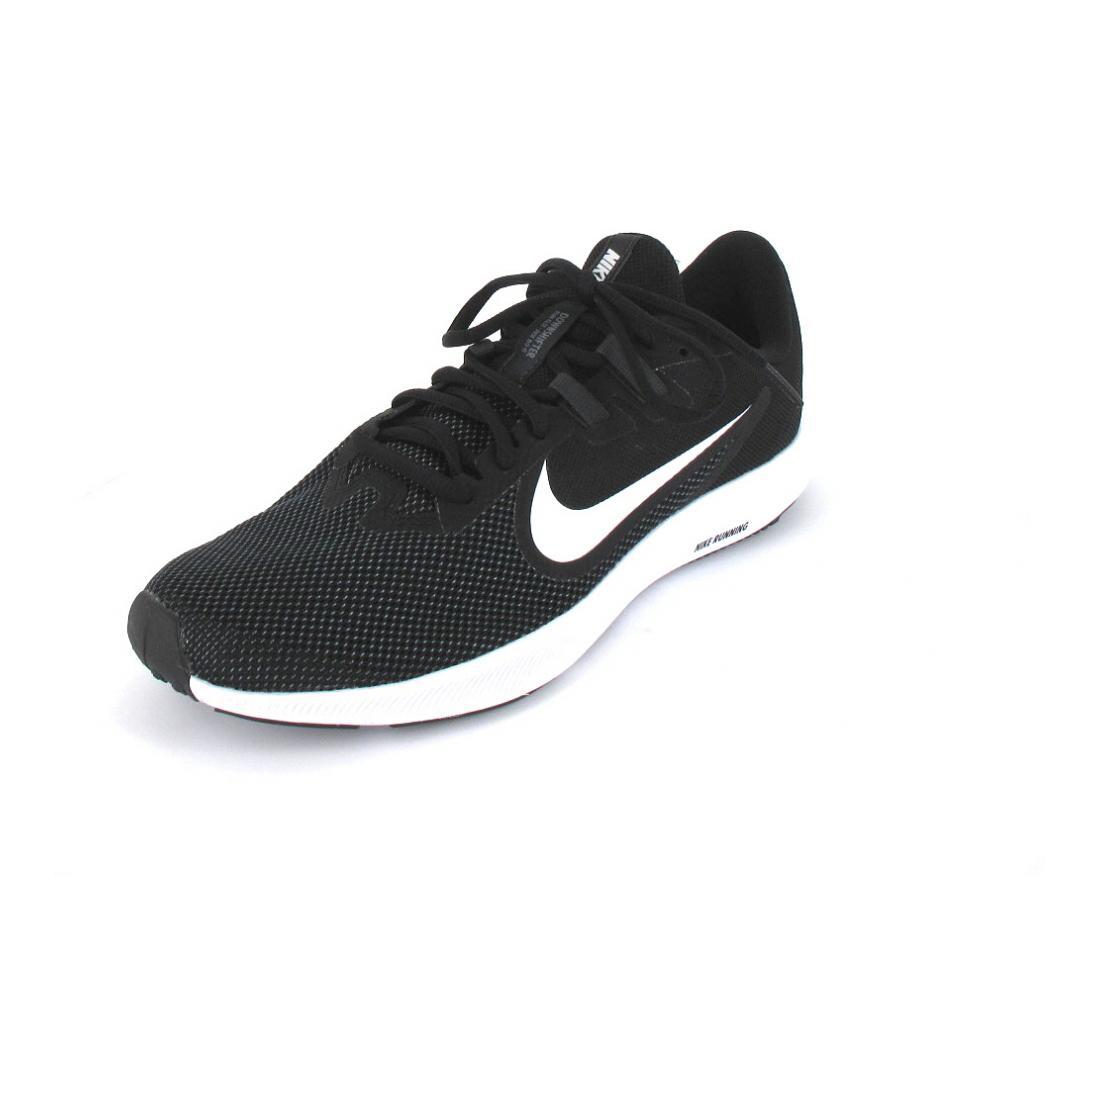 Nike Laufschuh Expolore Strada